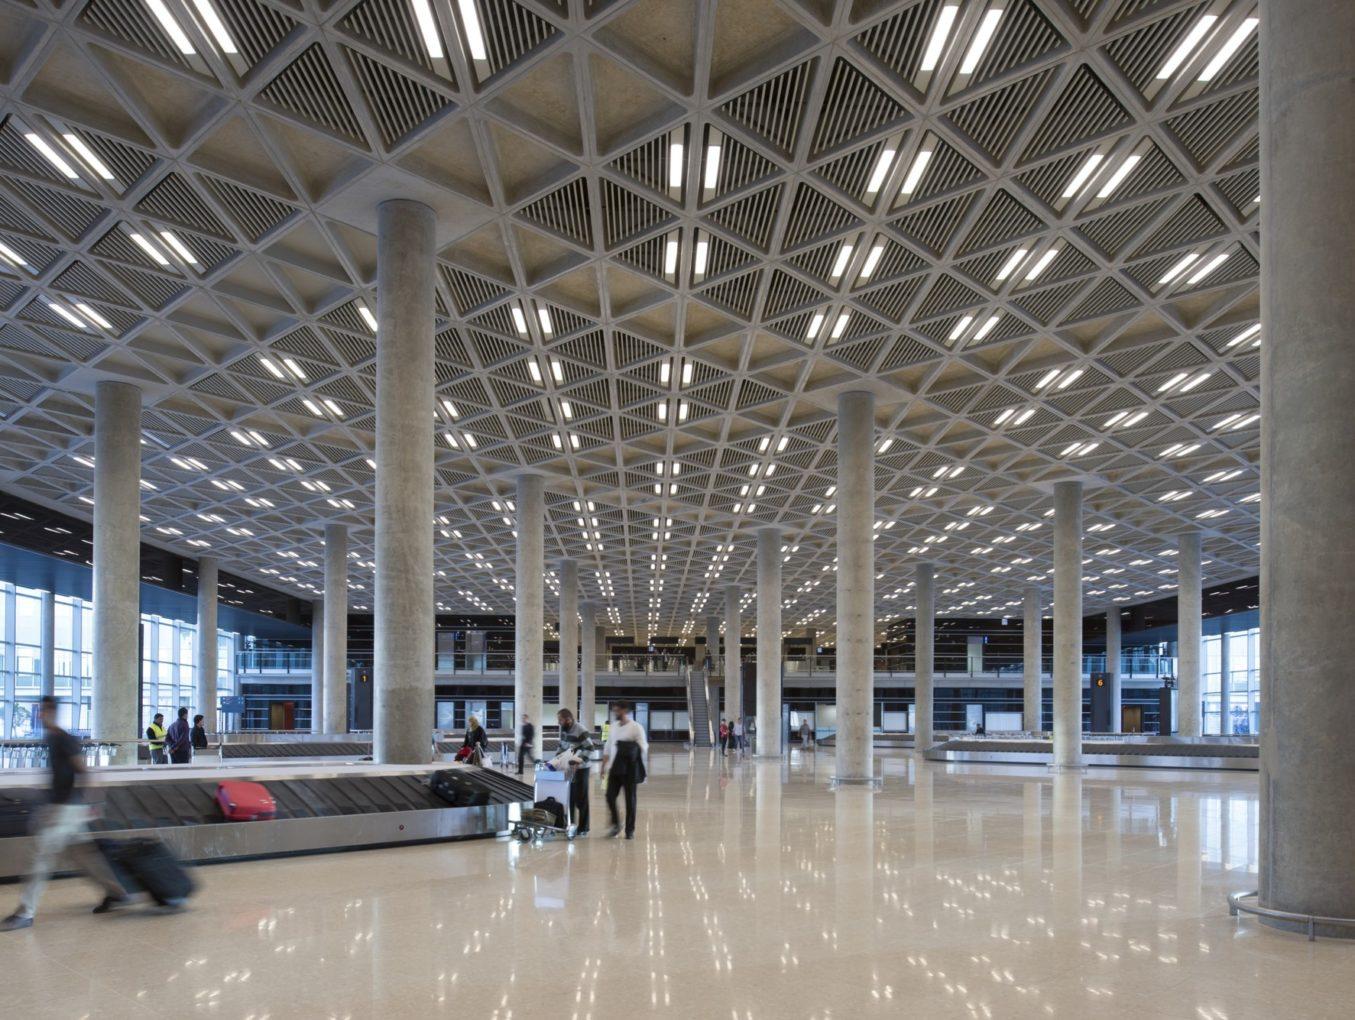 QUEEN ALIA INTERNATIONAL AIRPORT JORDAN